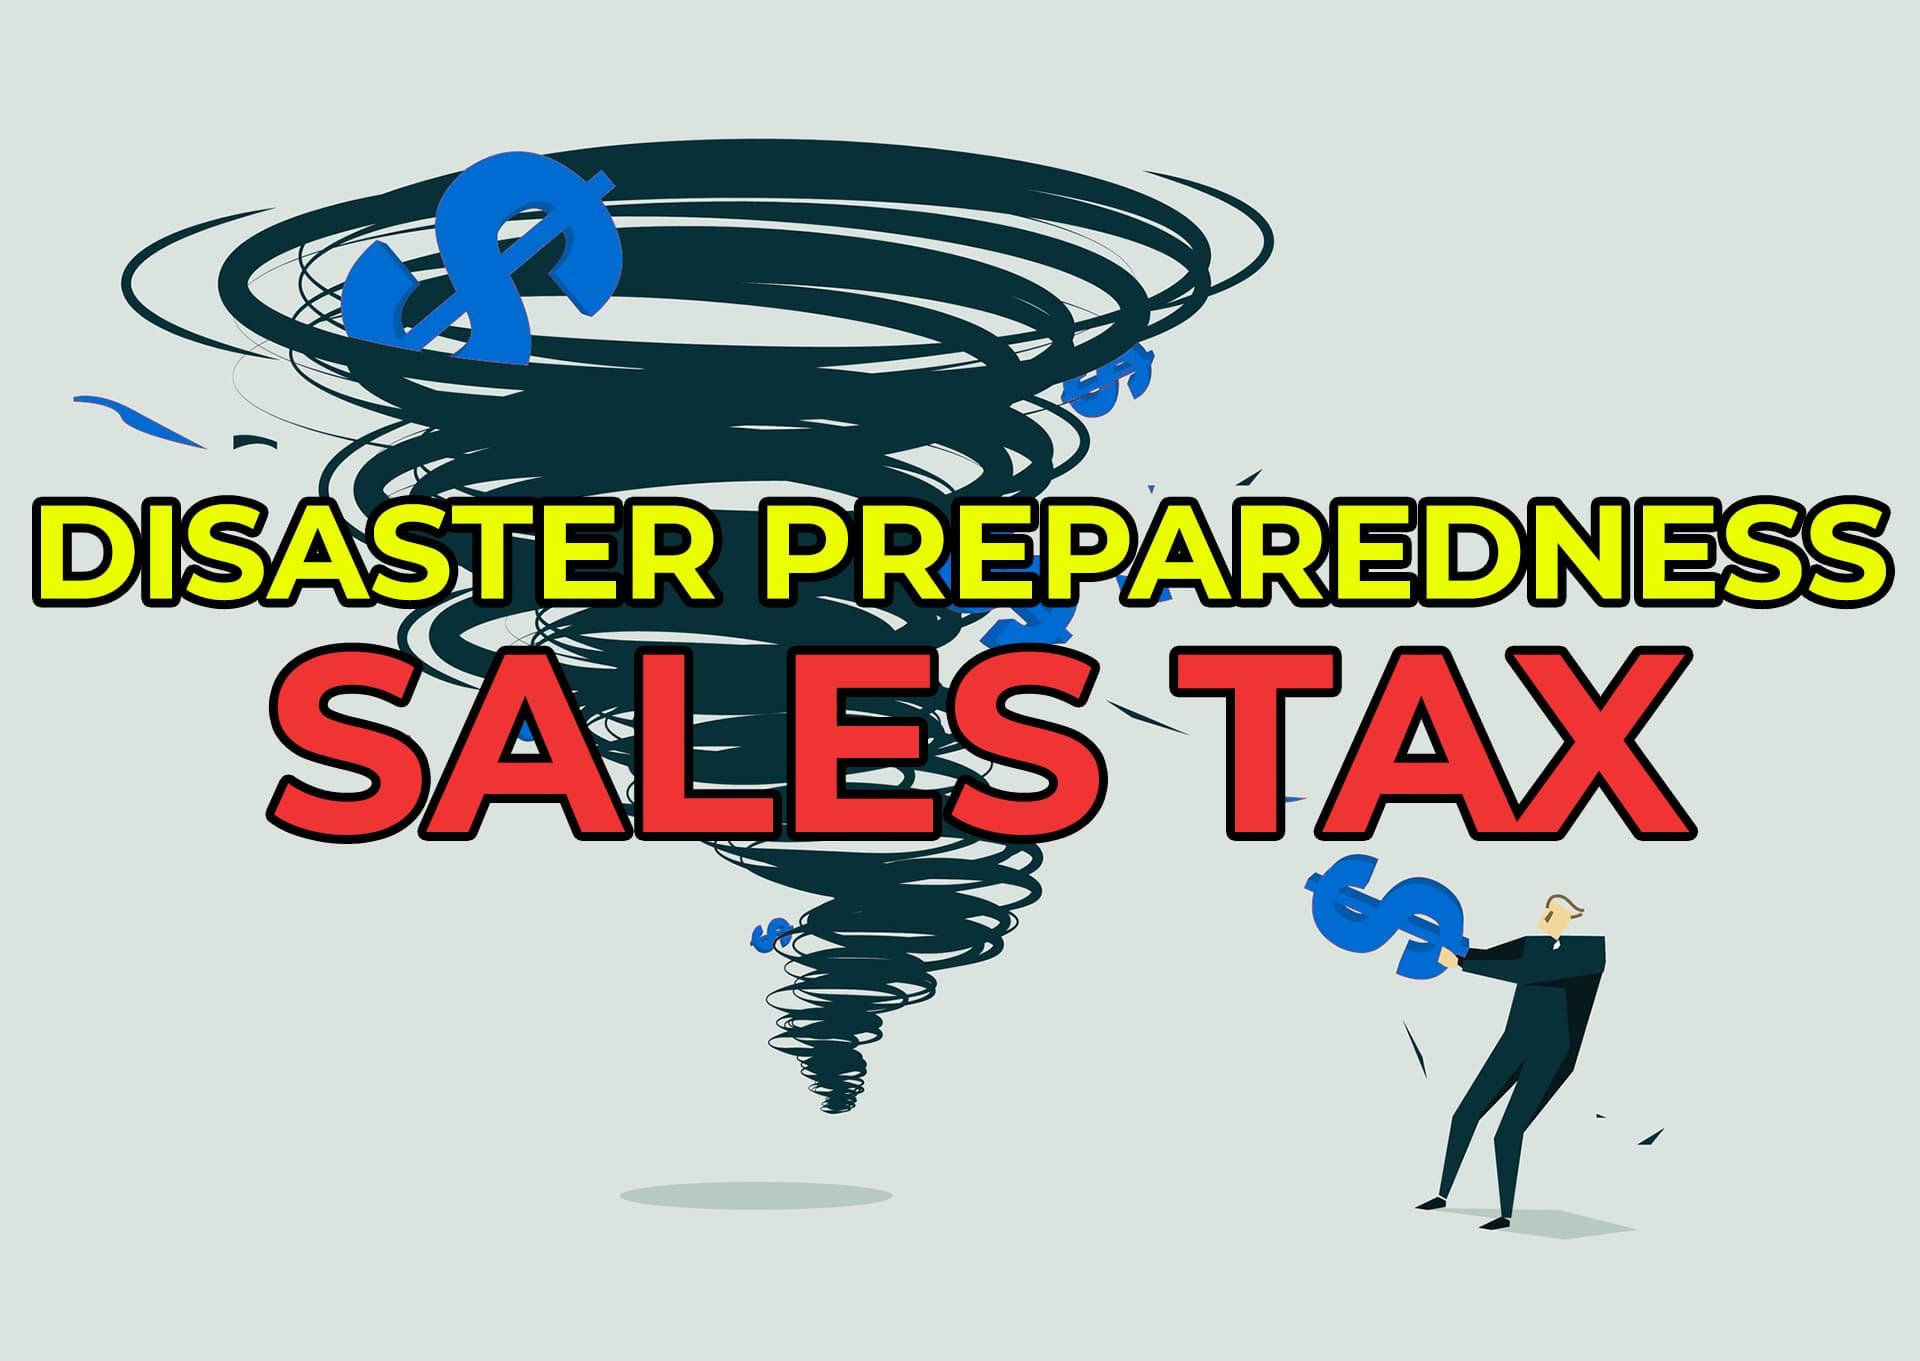 Disaster Preparedness Sales Tax